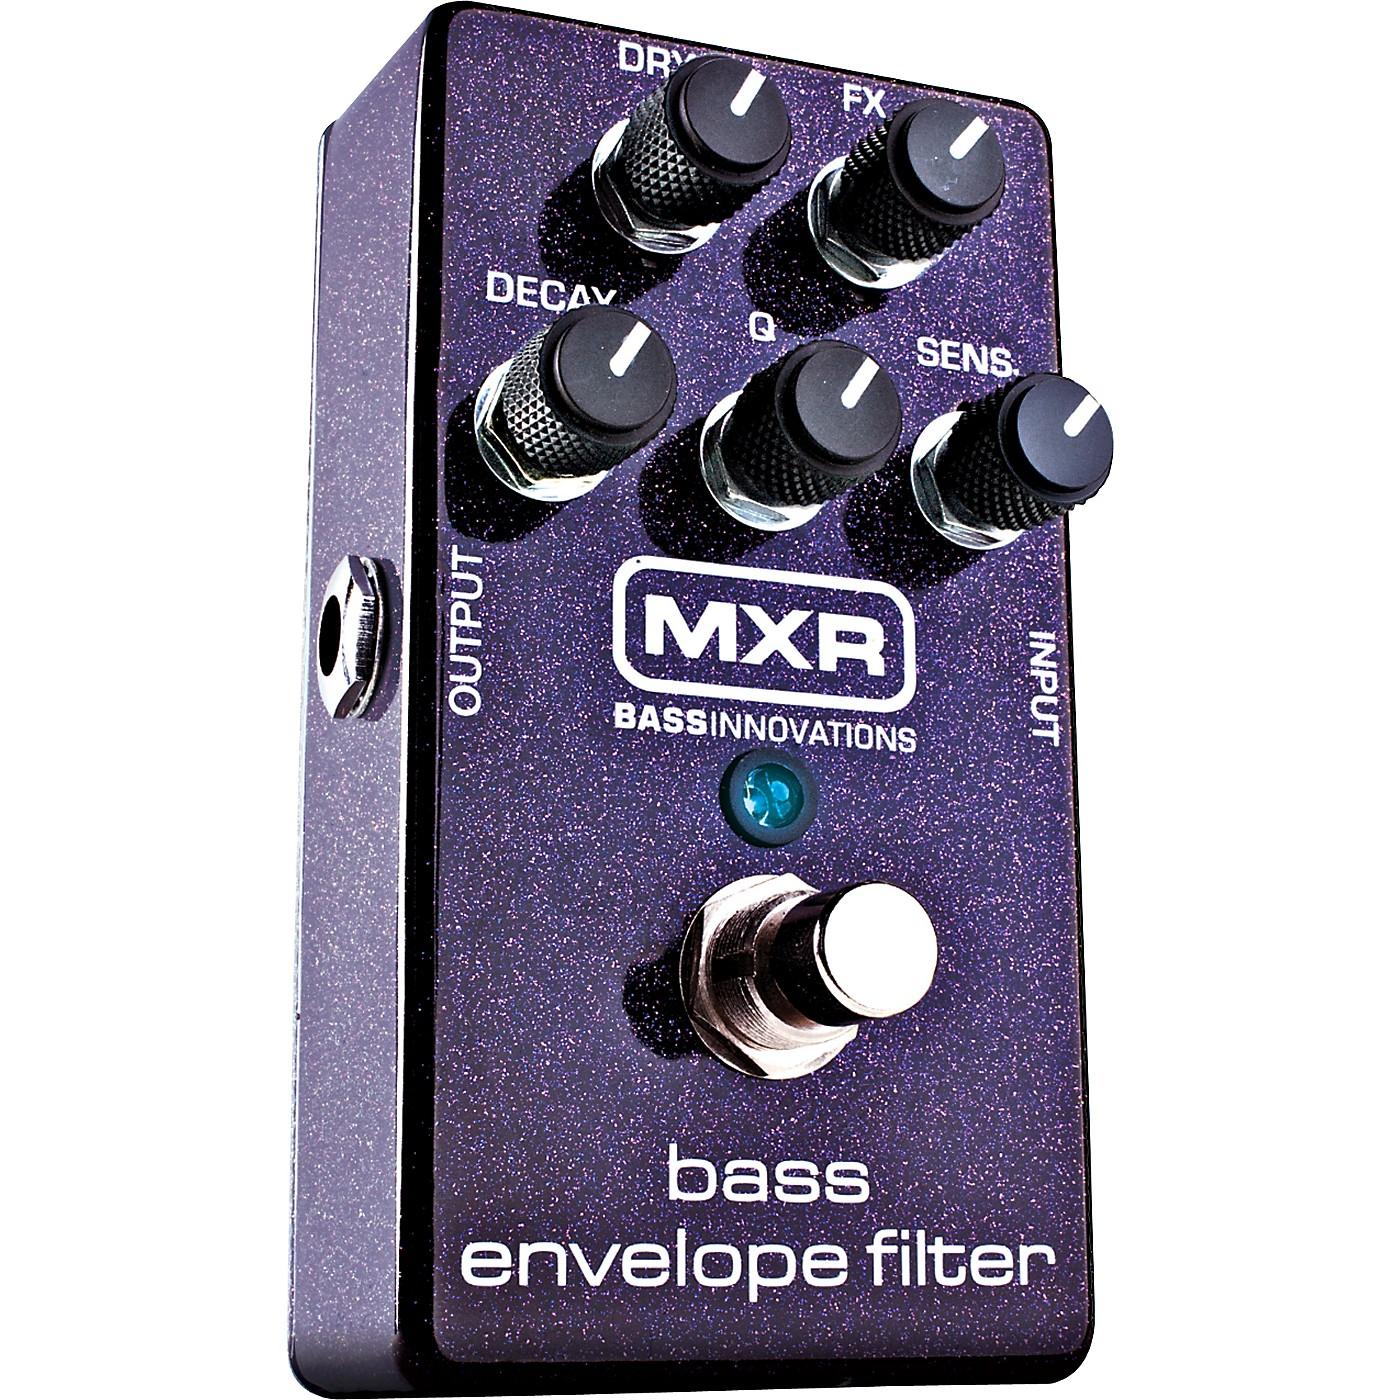 MXR M82 Bass Envelope Filter Effects Pedal thumbnail